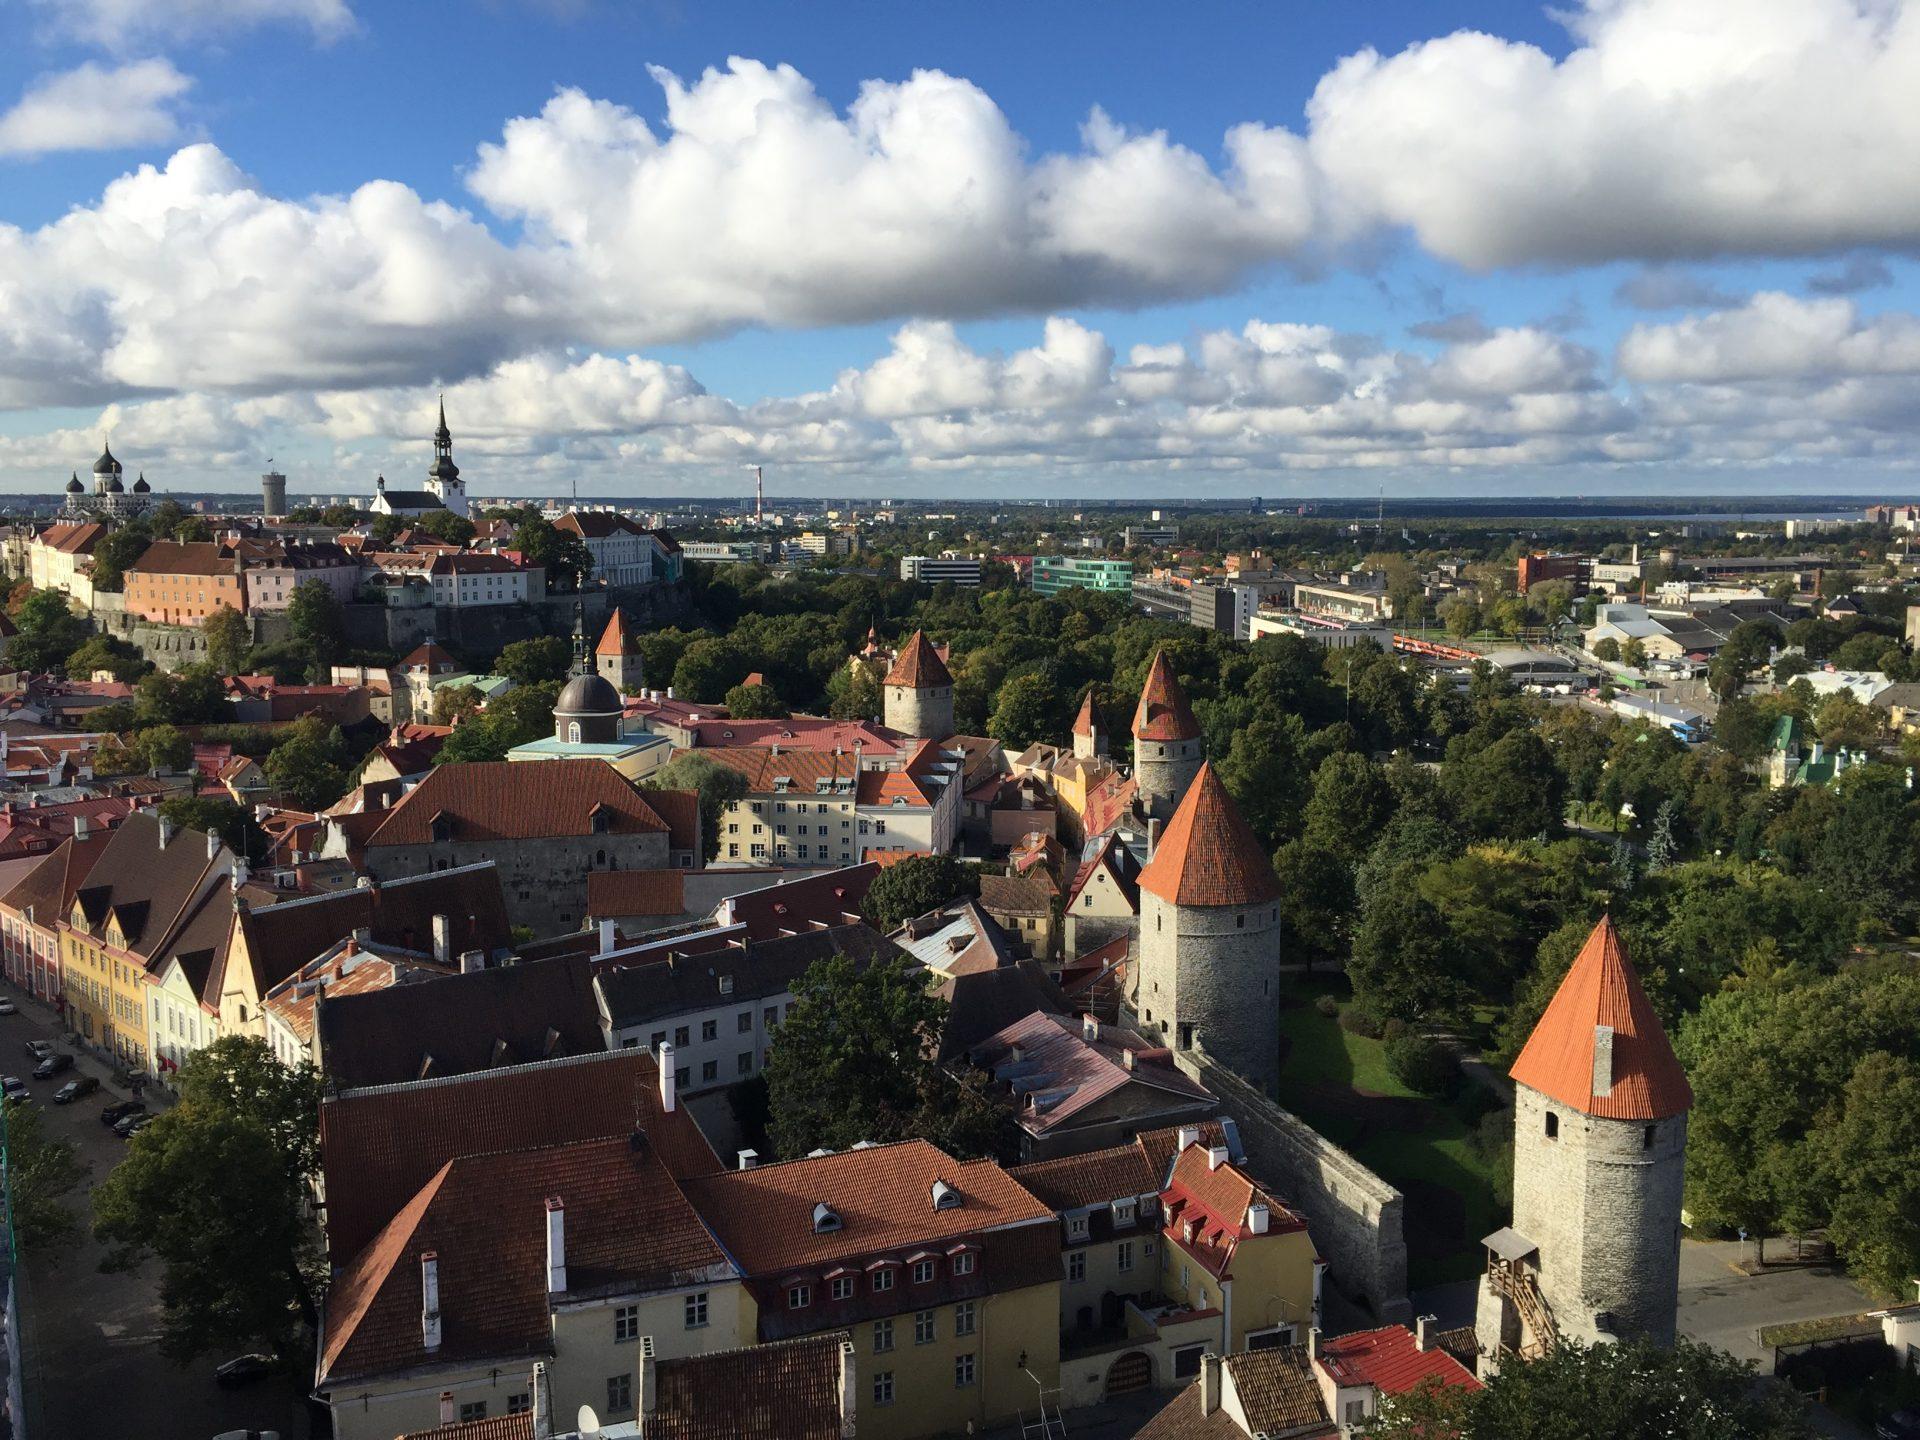 Exploring the views of the Old Town Tallinn, Estonia